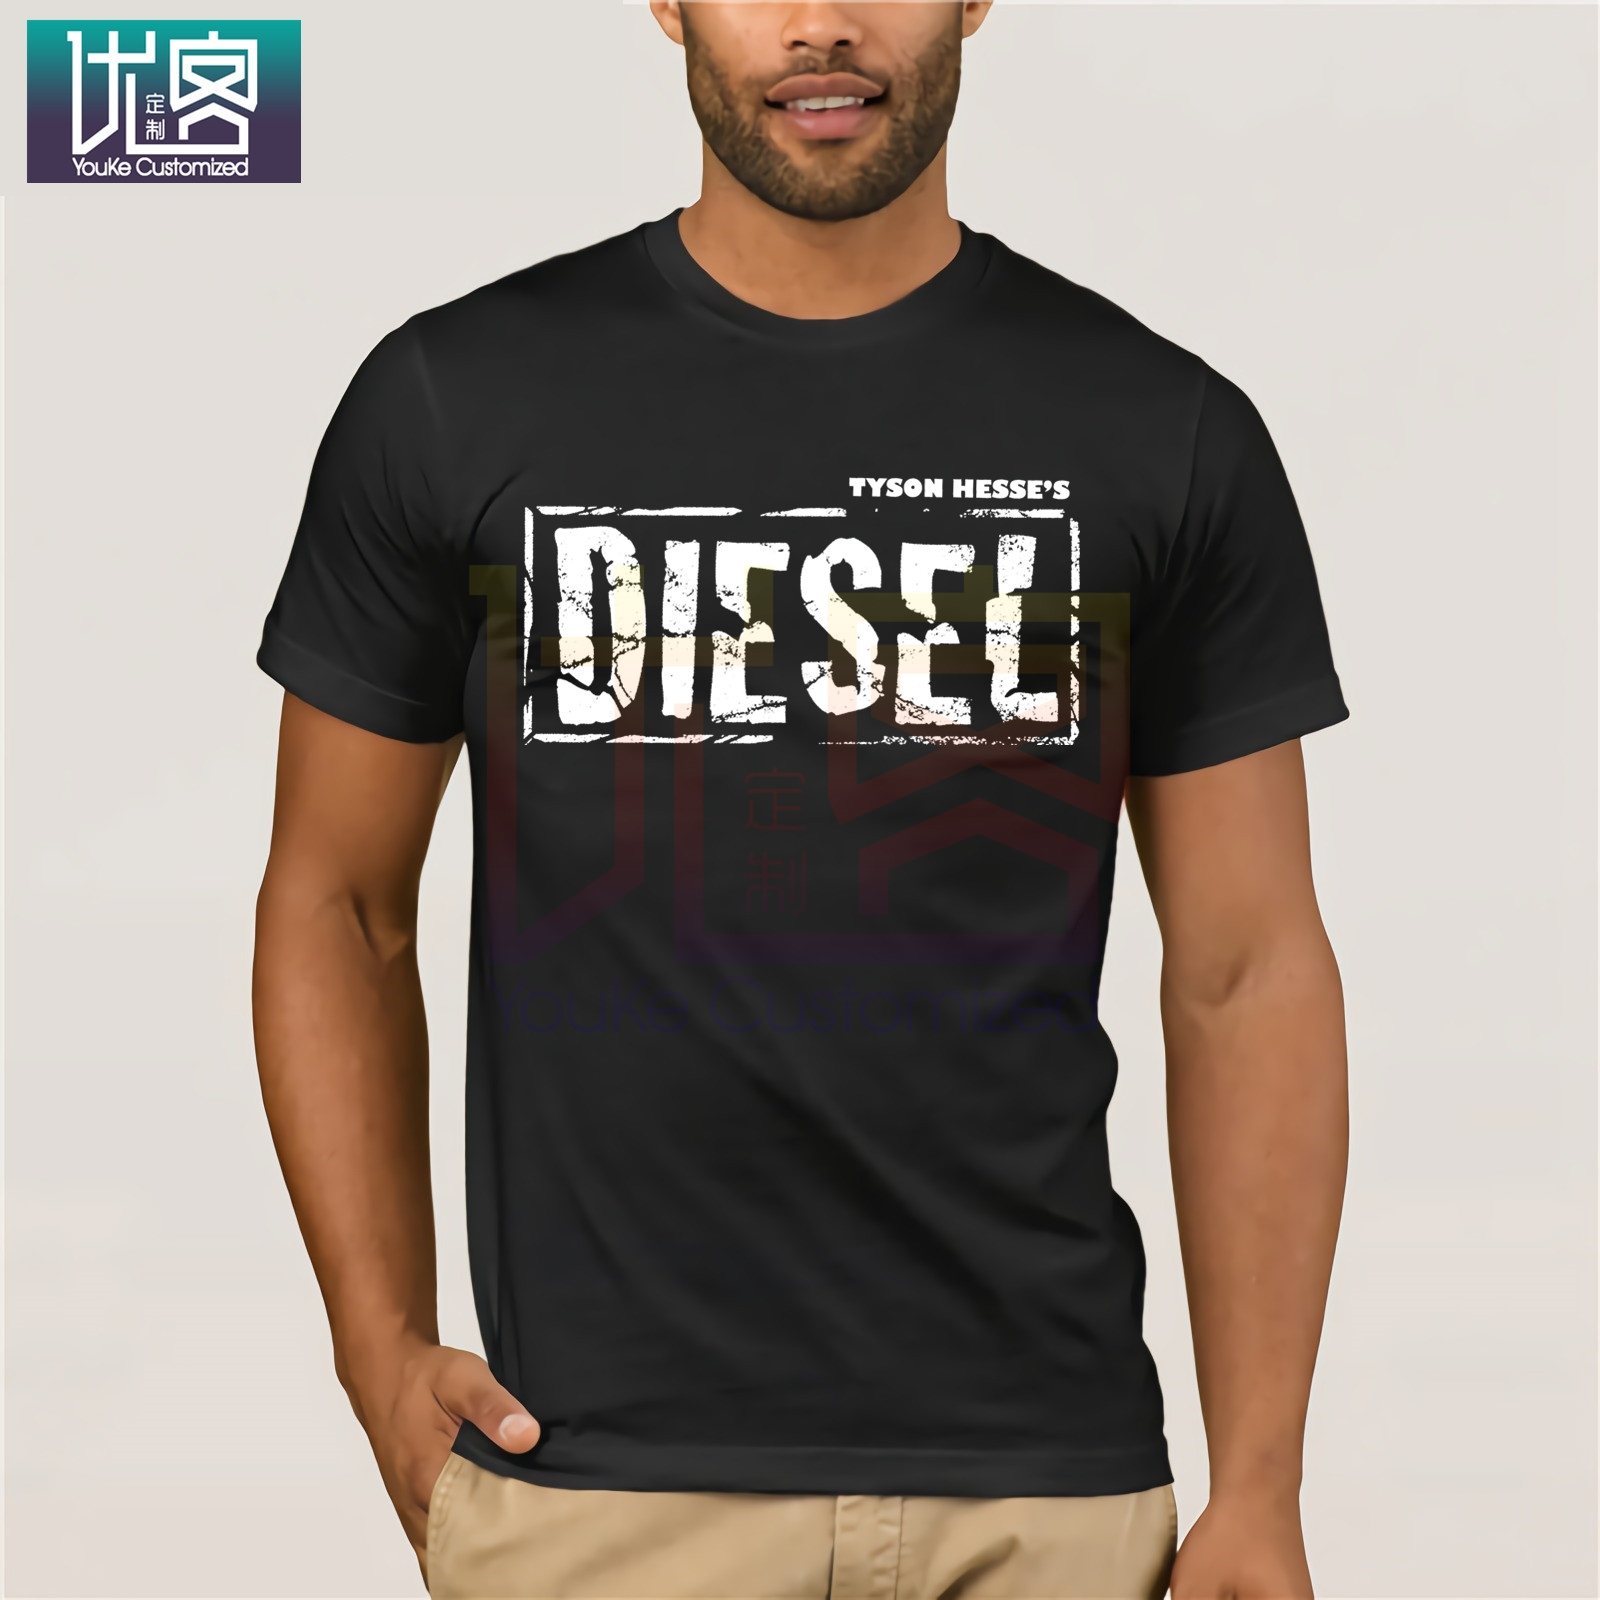 White Diesel Logo Shirts Clothes Popular T-shirt Crewneck 100% Cotton Tees Tops Summer Tees Cotton O Neck Herre T-Shirt